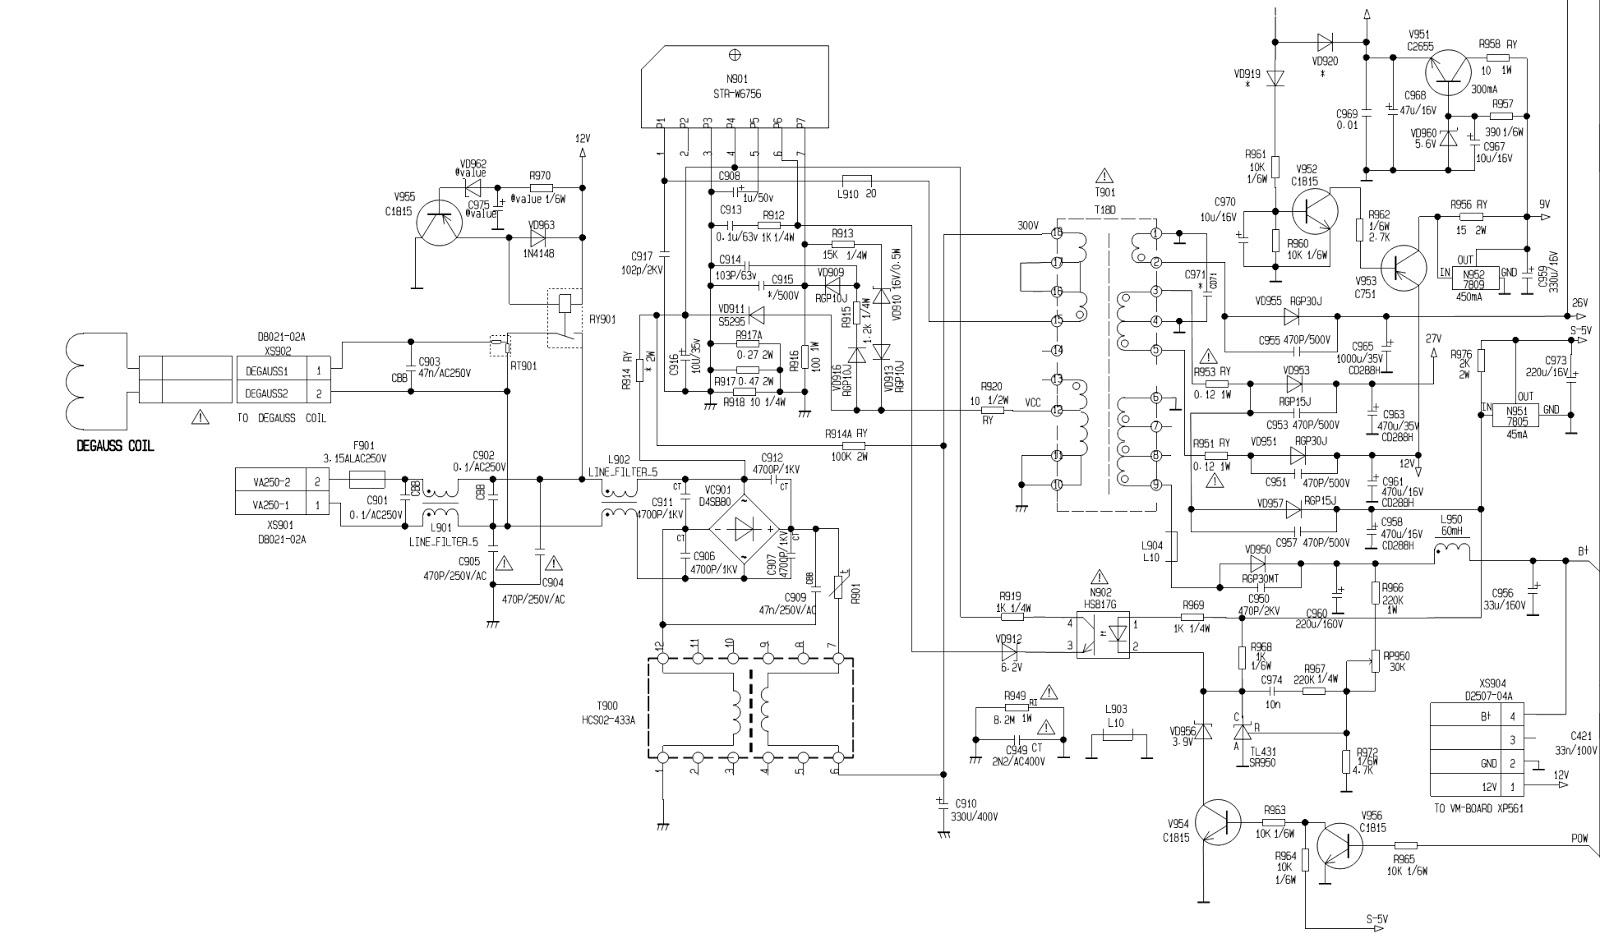 Konka Kp2962 Crt Tv Schematic Lv 116n Tda 7263 La 76932 T V Circuit Diagram 75665 8177 Str W6756 Hs817g Opto Coupler